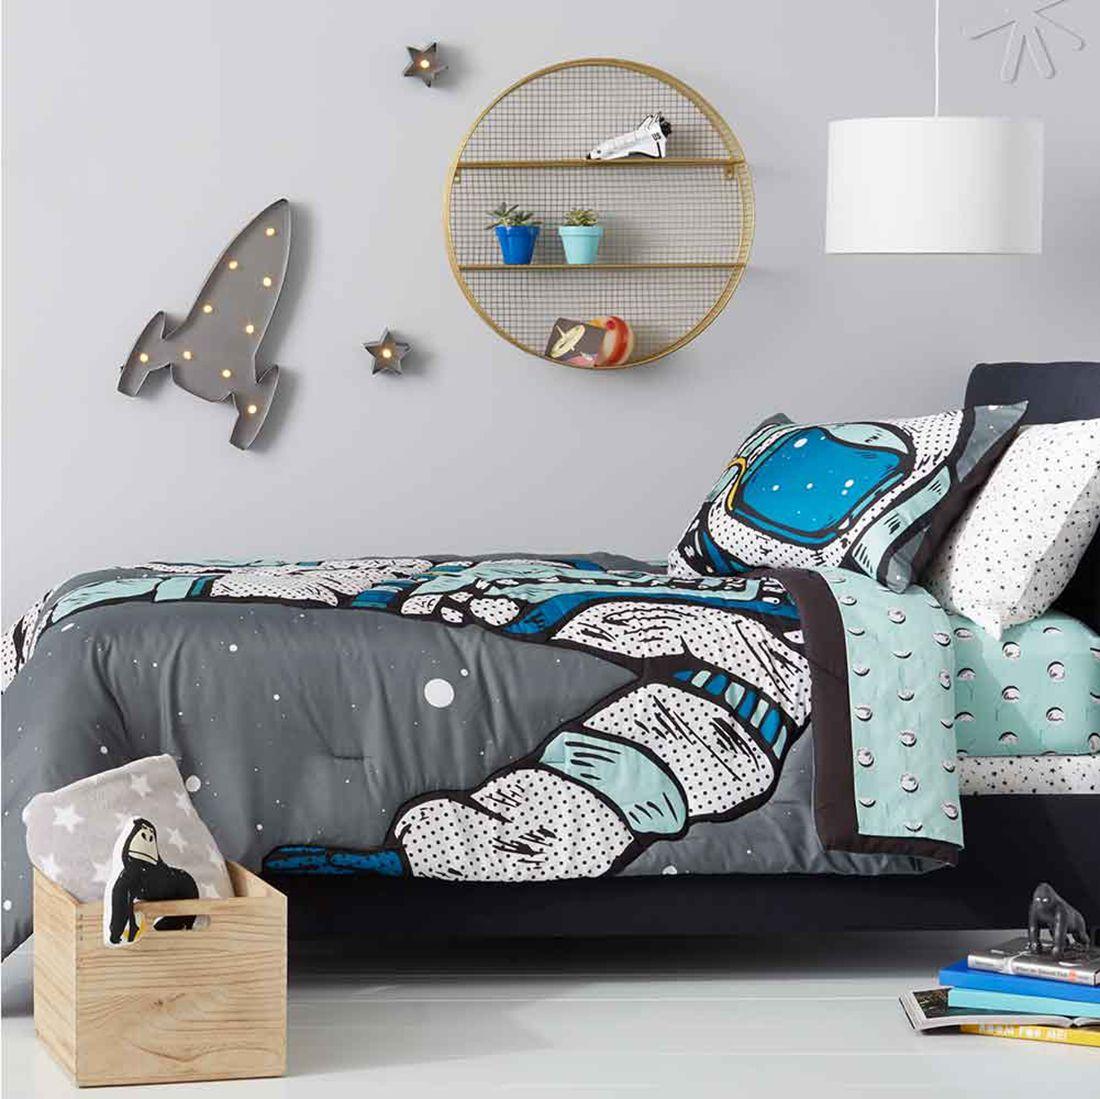 Target Kids Bedroom Furniture Targets New Gender Neutral Kids Decor Line Might Be The Most